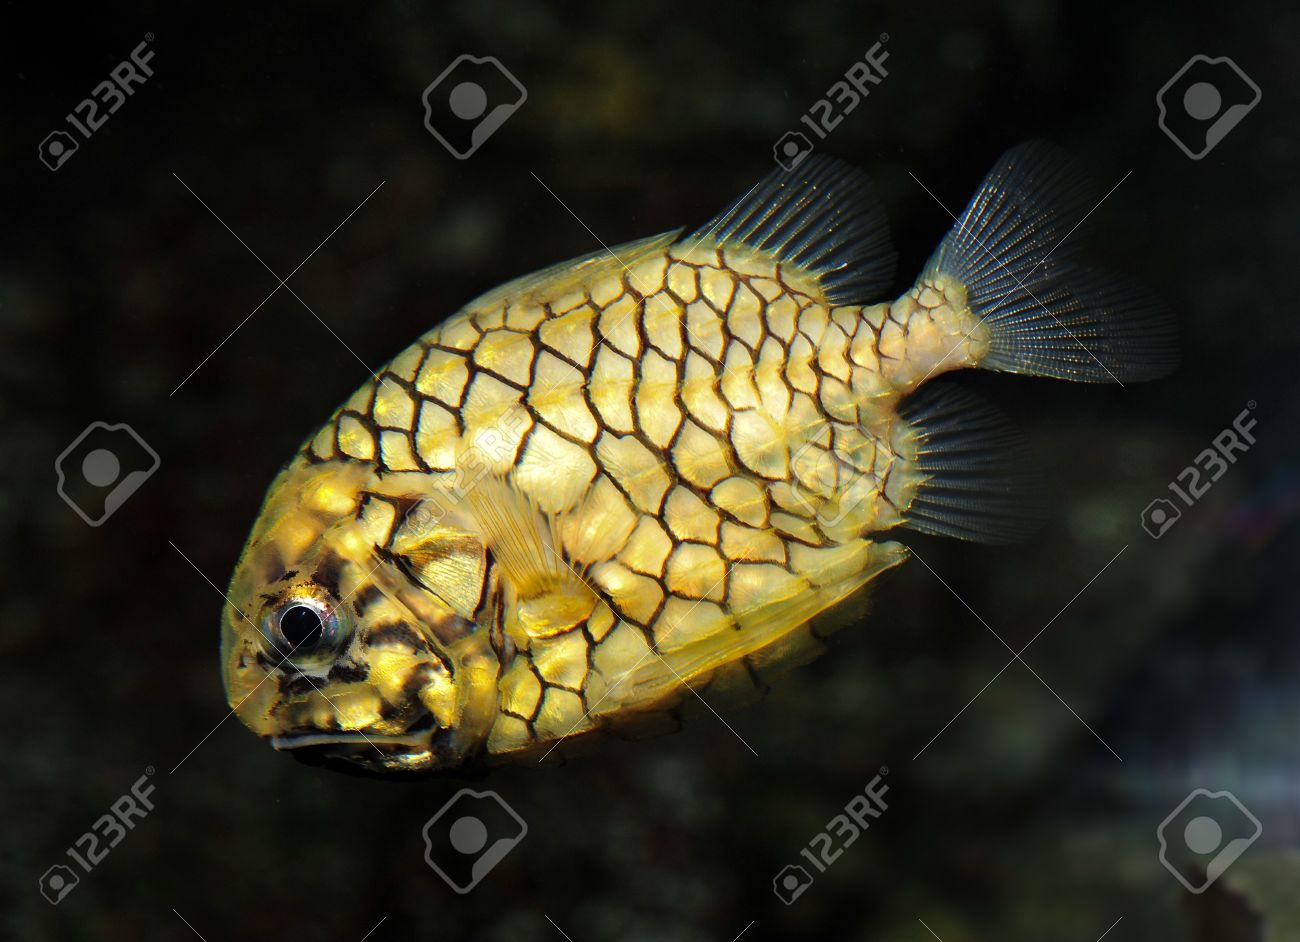 marine fish, corral fish, pineapple fish Stock Photo - 12179666